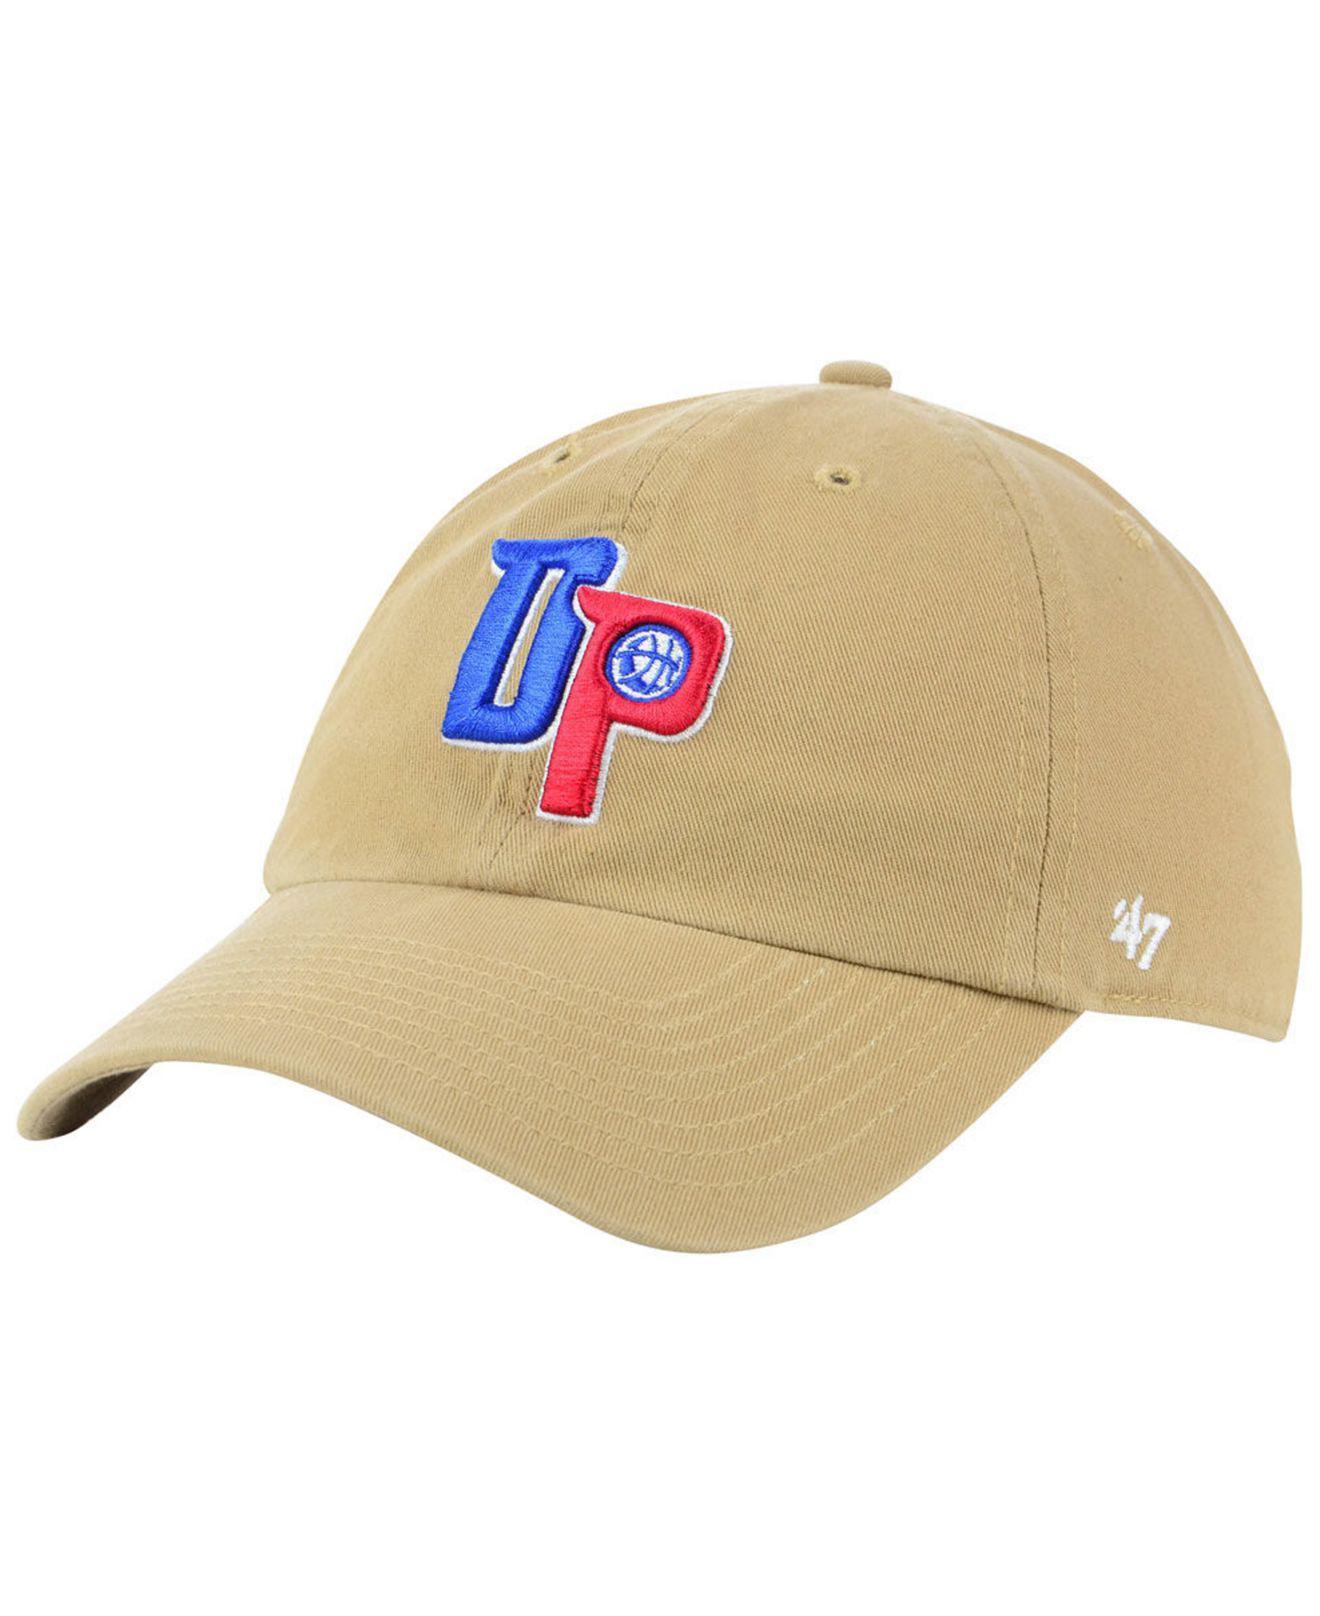 superior quality 274f3 7fff0 47 Brand. Men s Detroit Pistons Mash Up Clean Up Cap